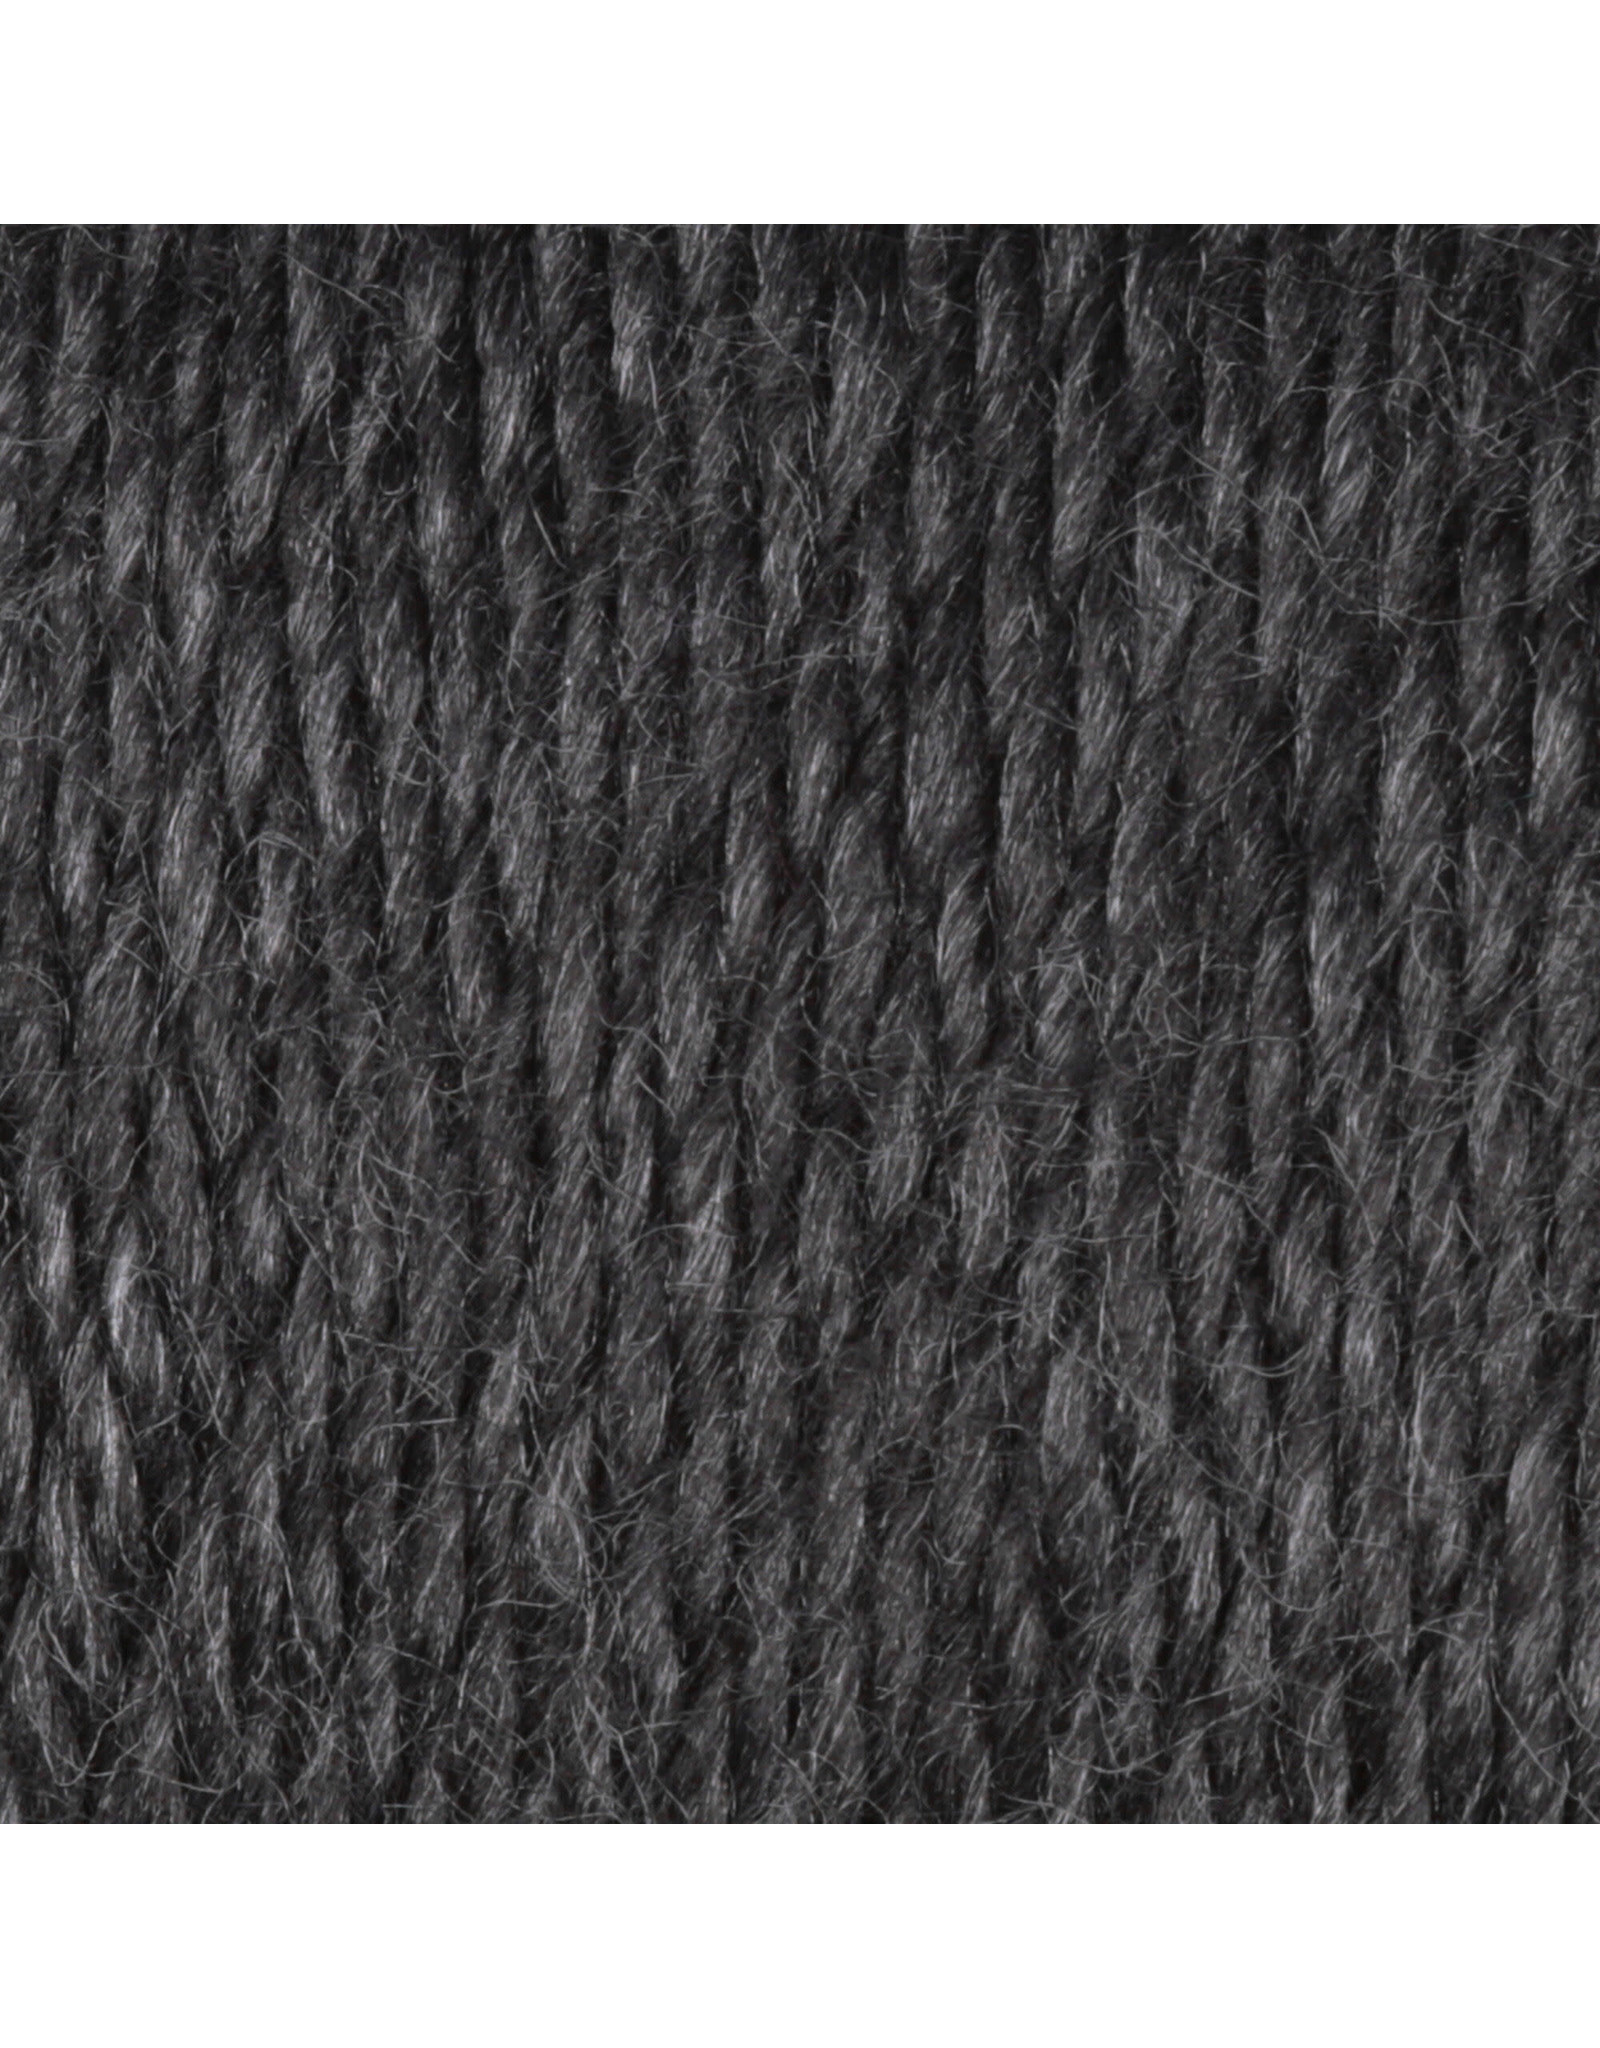 Charcoal Heather - Simply Soft Heathers - Caron